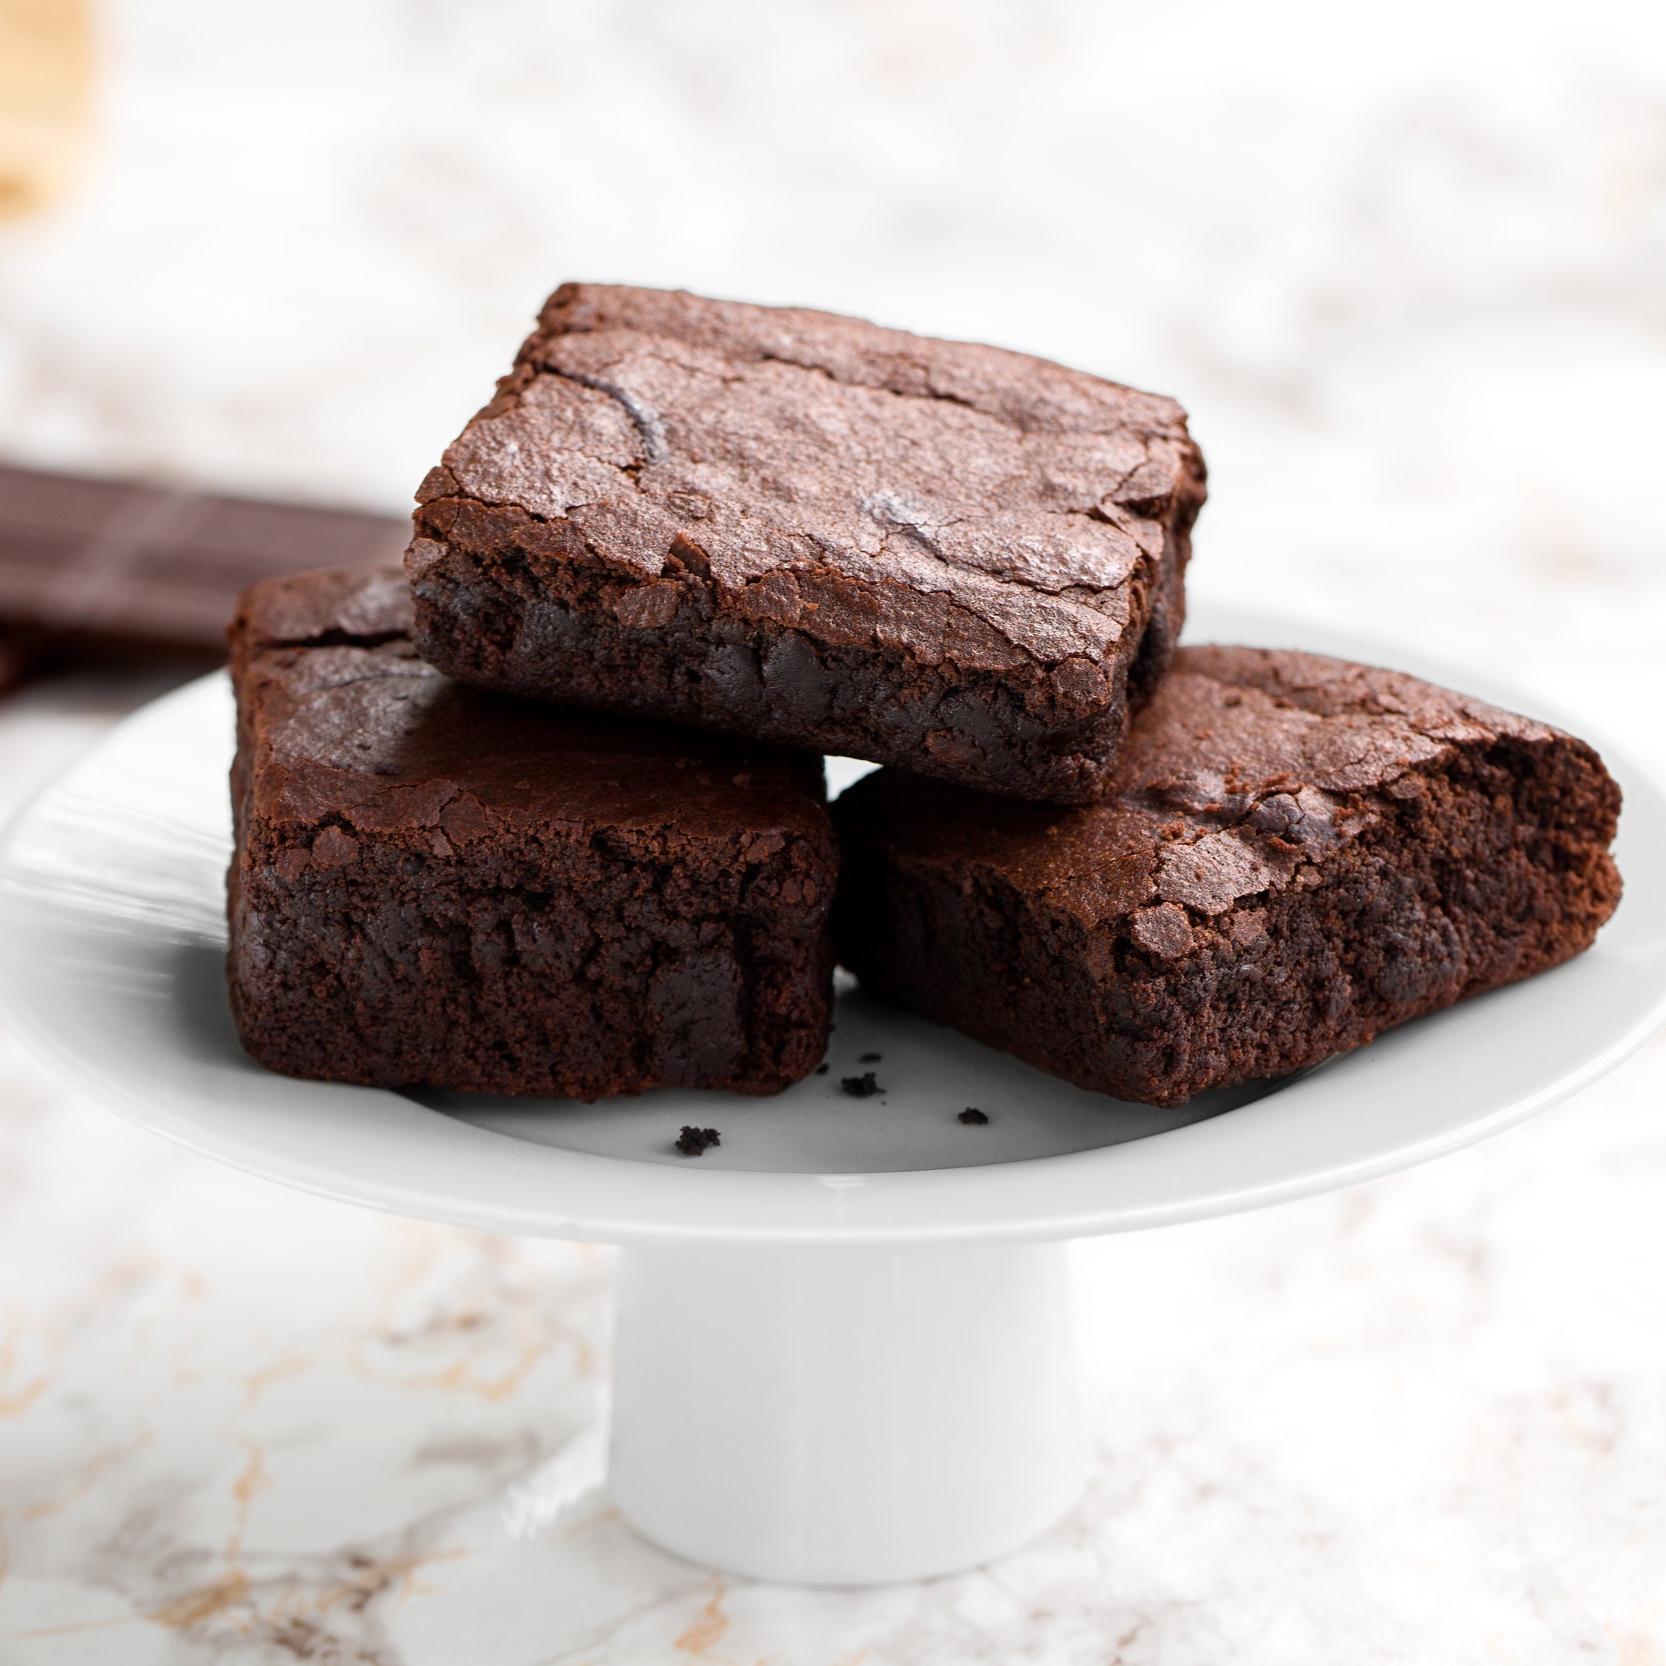 Brownies - Scratch-made fudgy brownies.